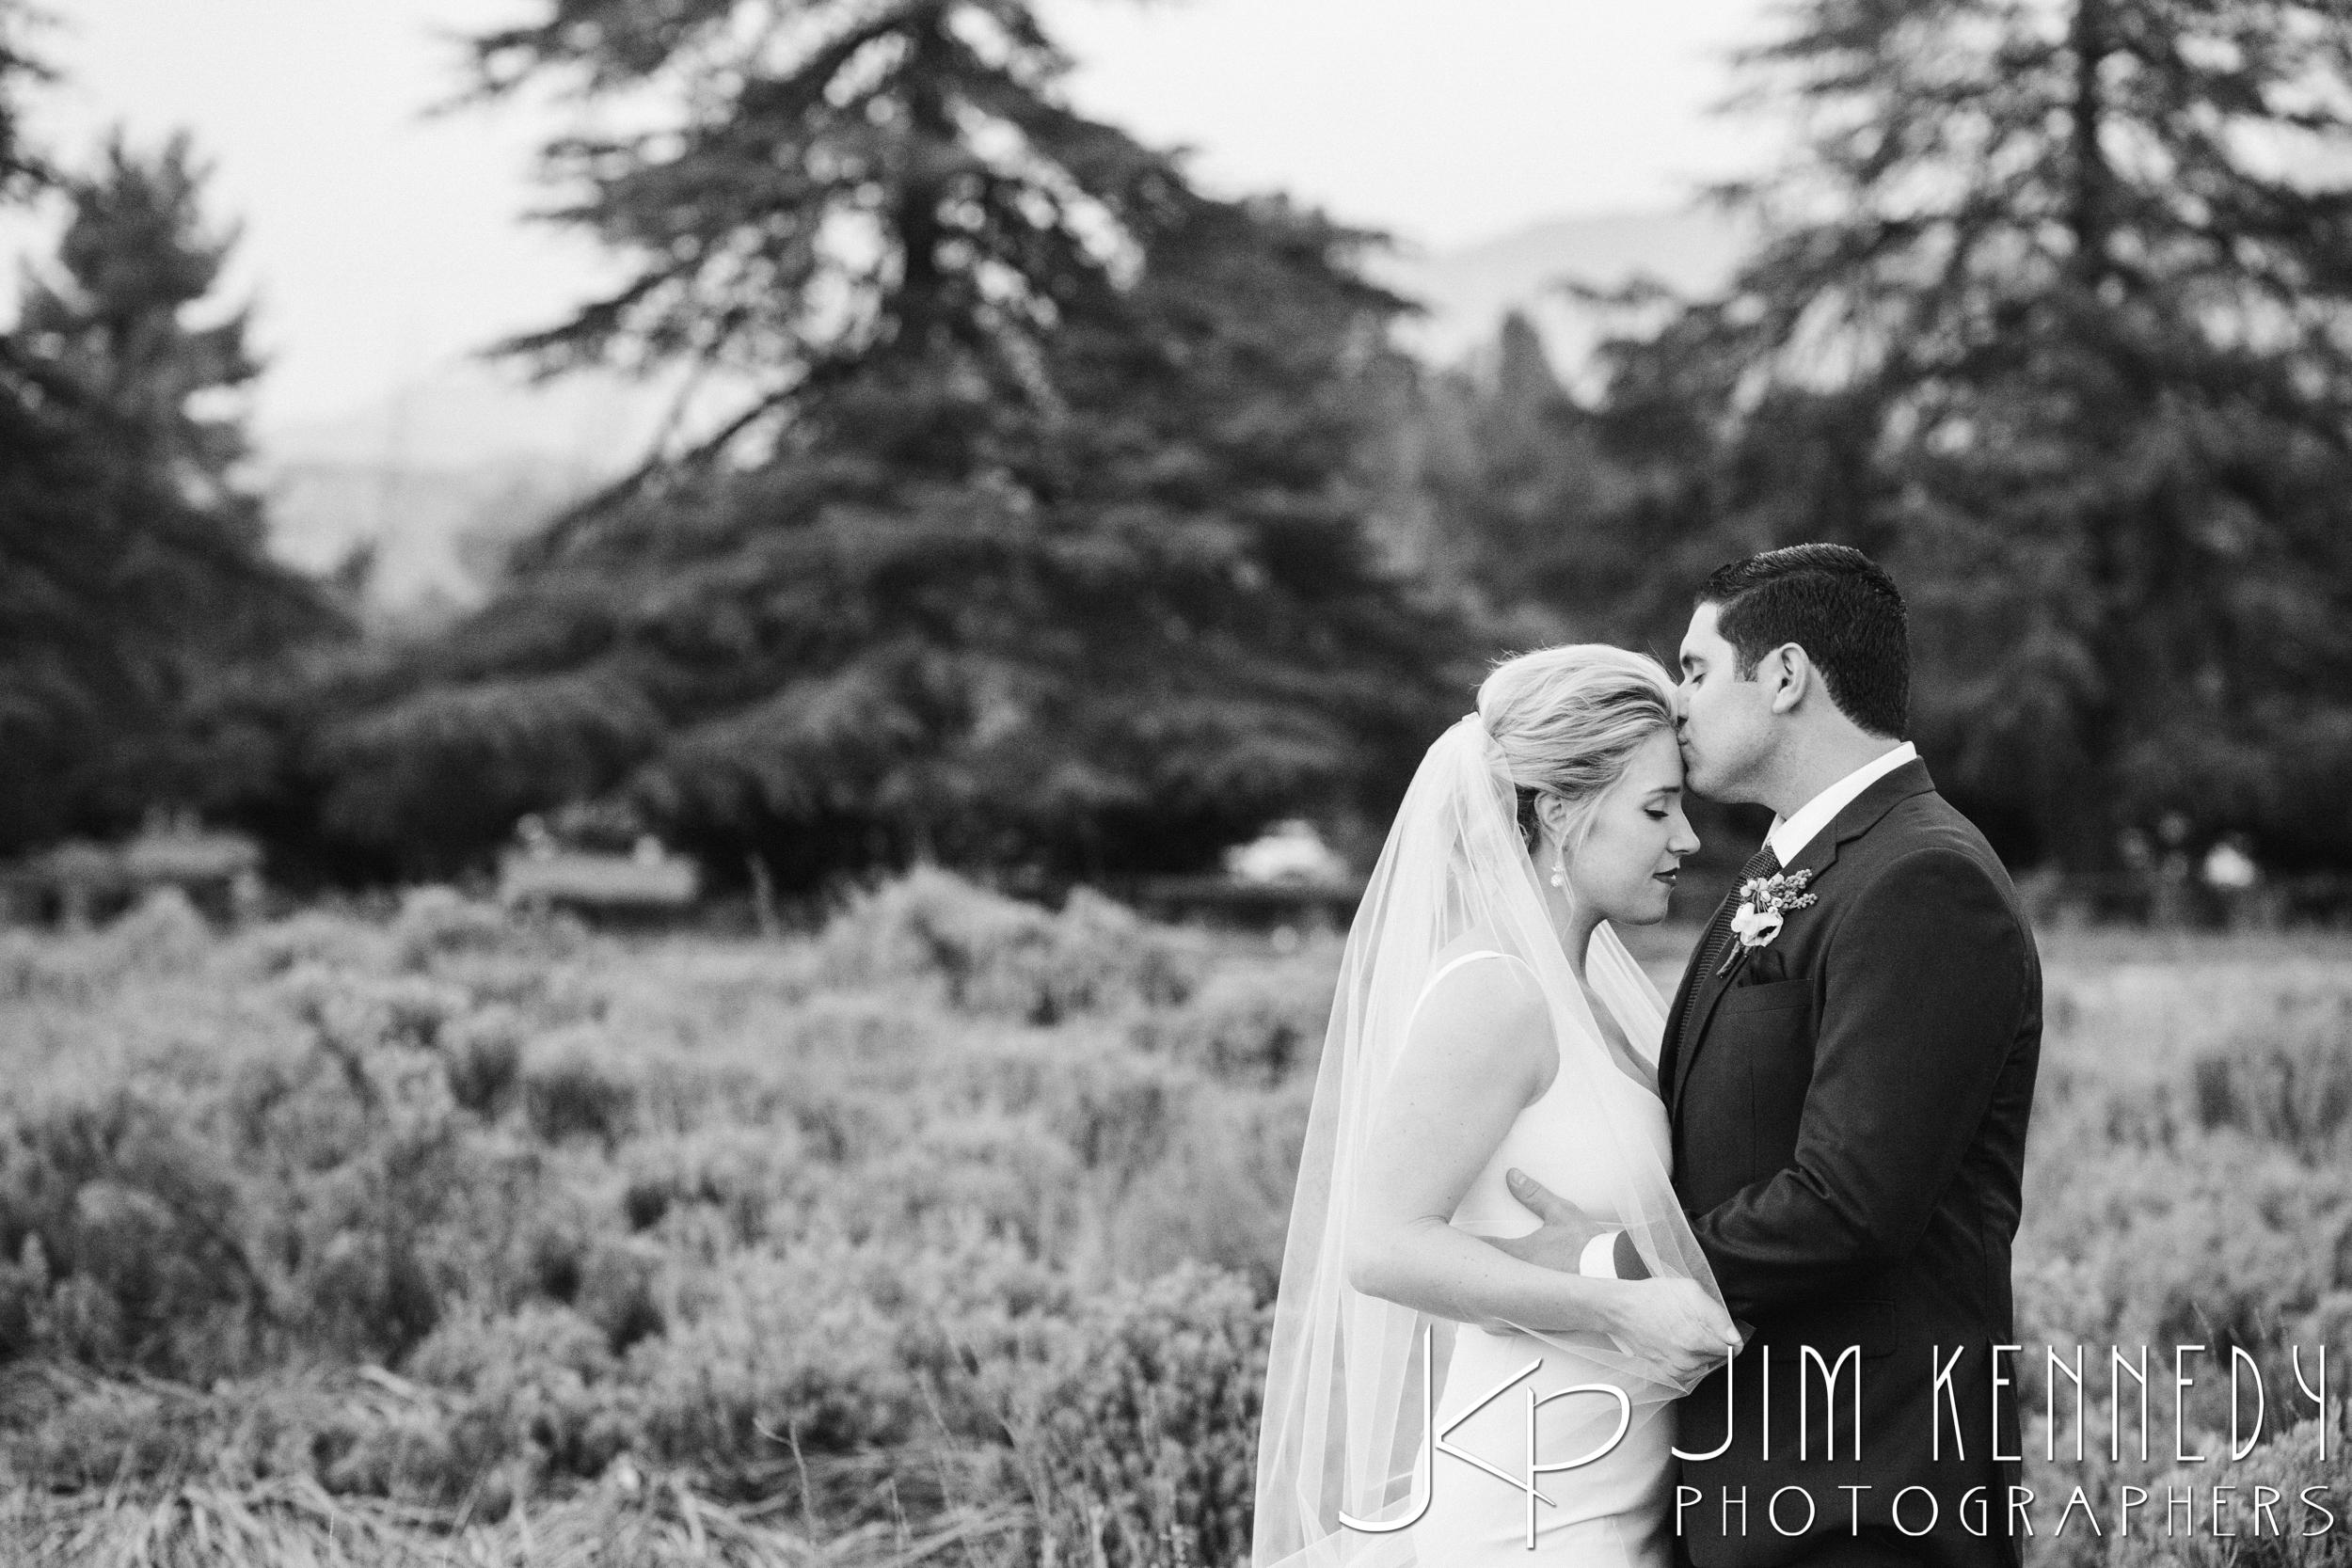 jim_kennedy_photographers_highland_springs_wedding_caitlyn_0165.jpg